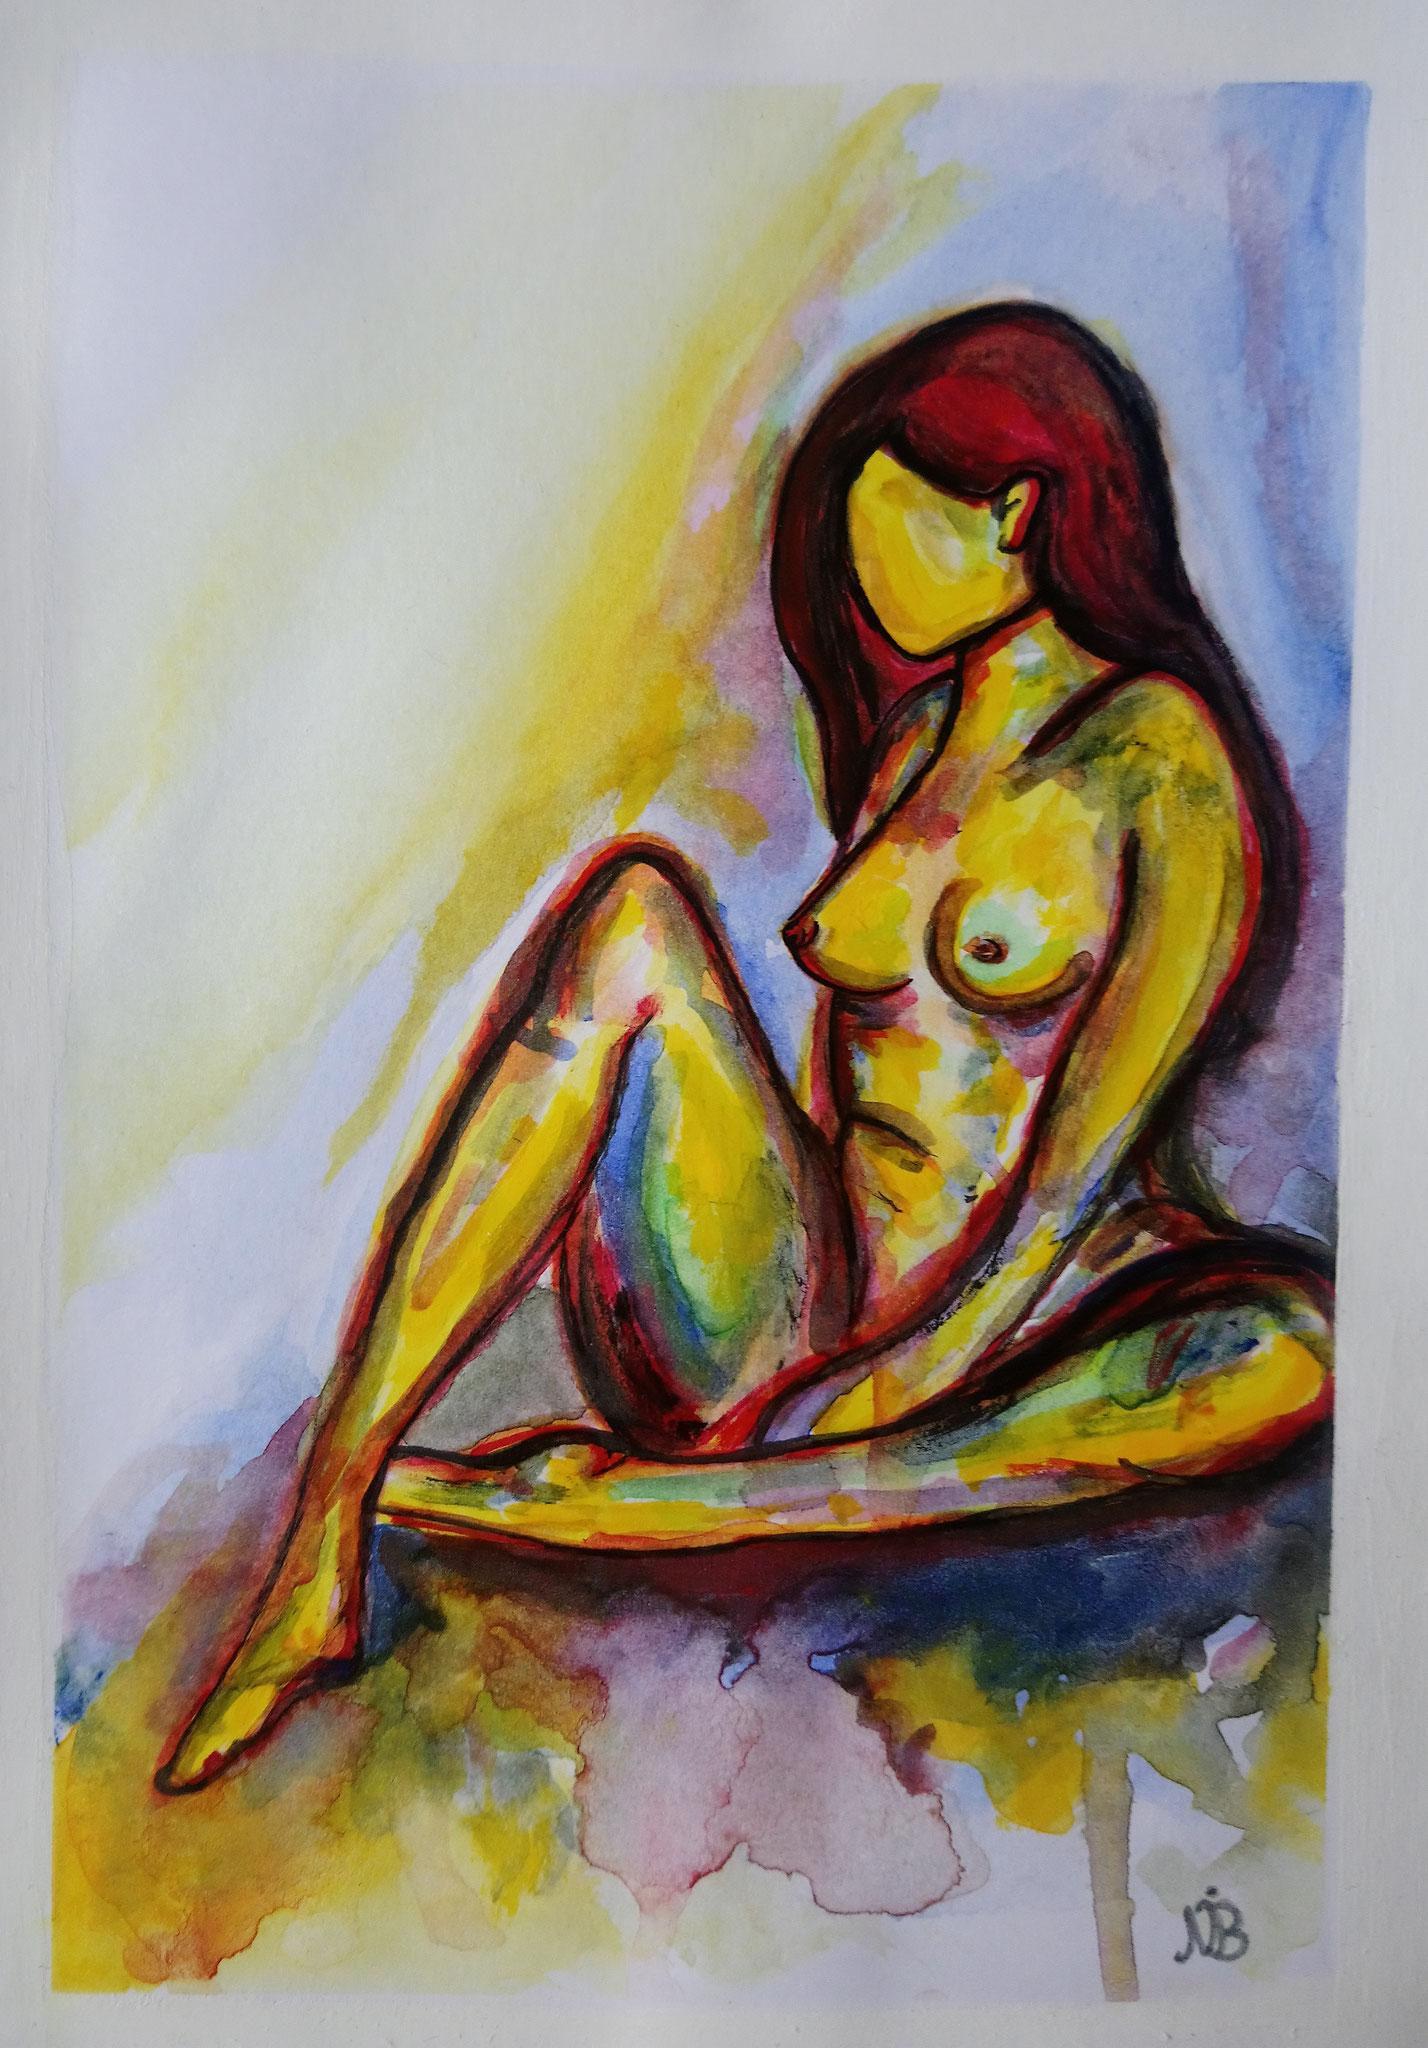 Art 86 (14,8x21)